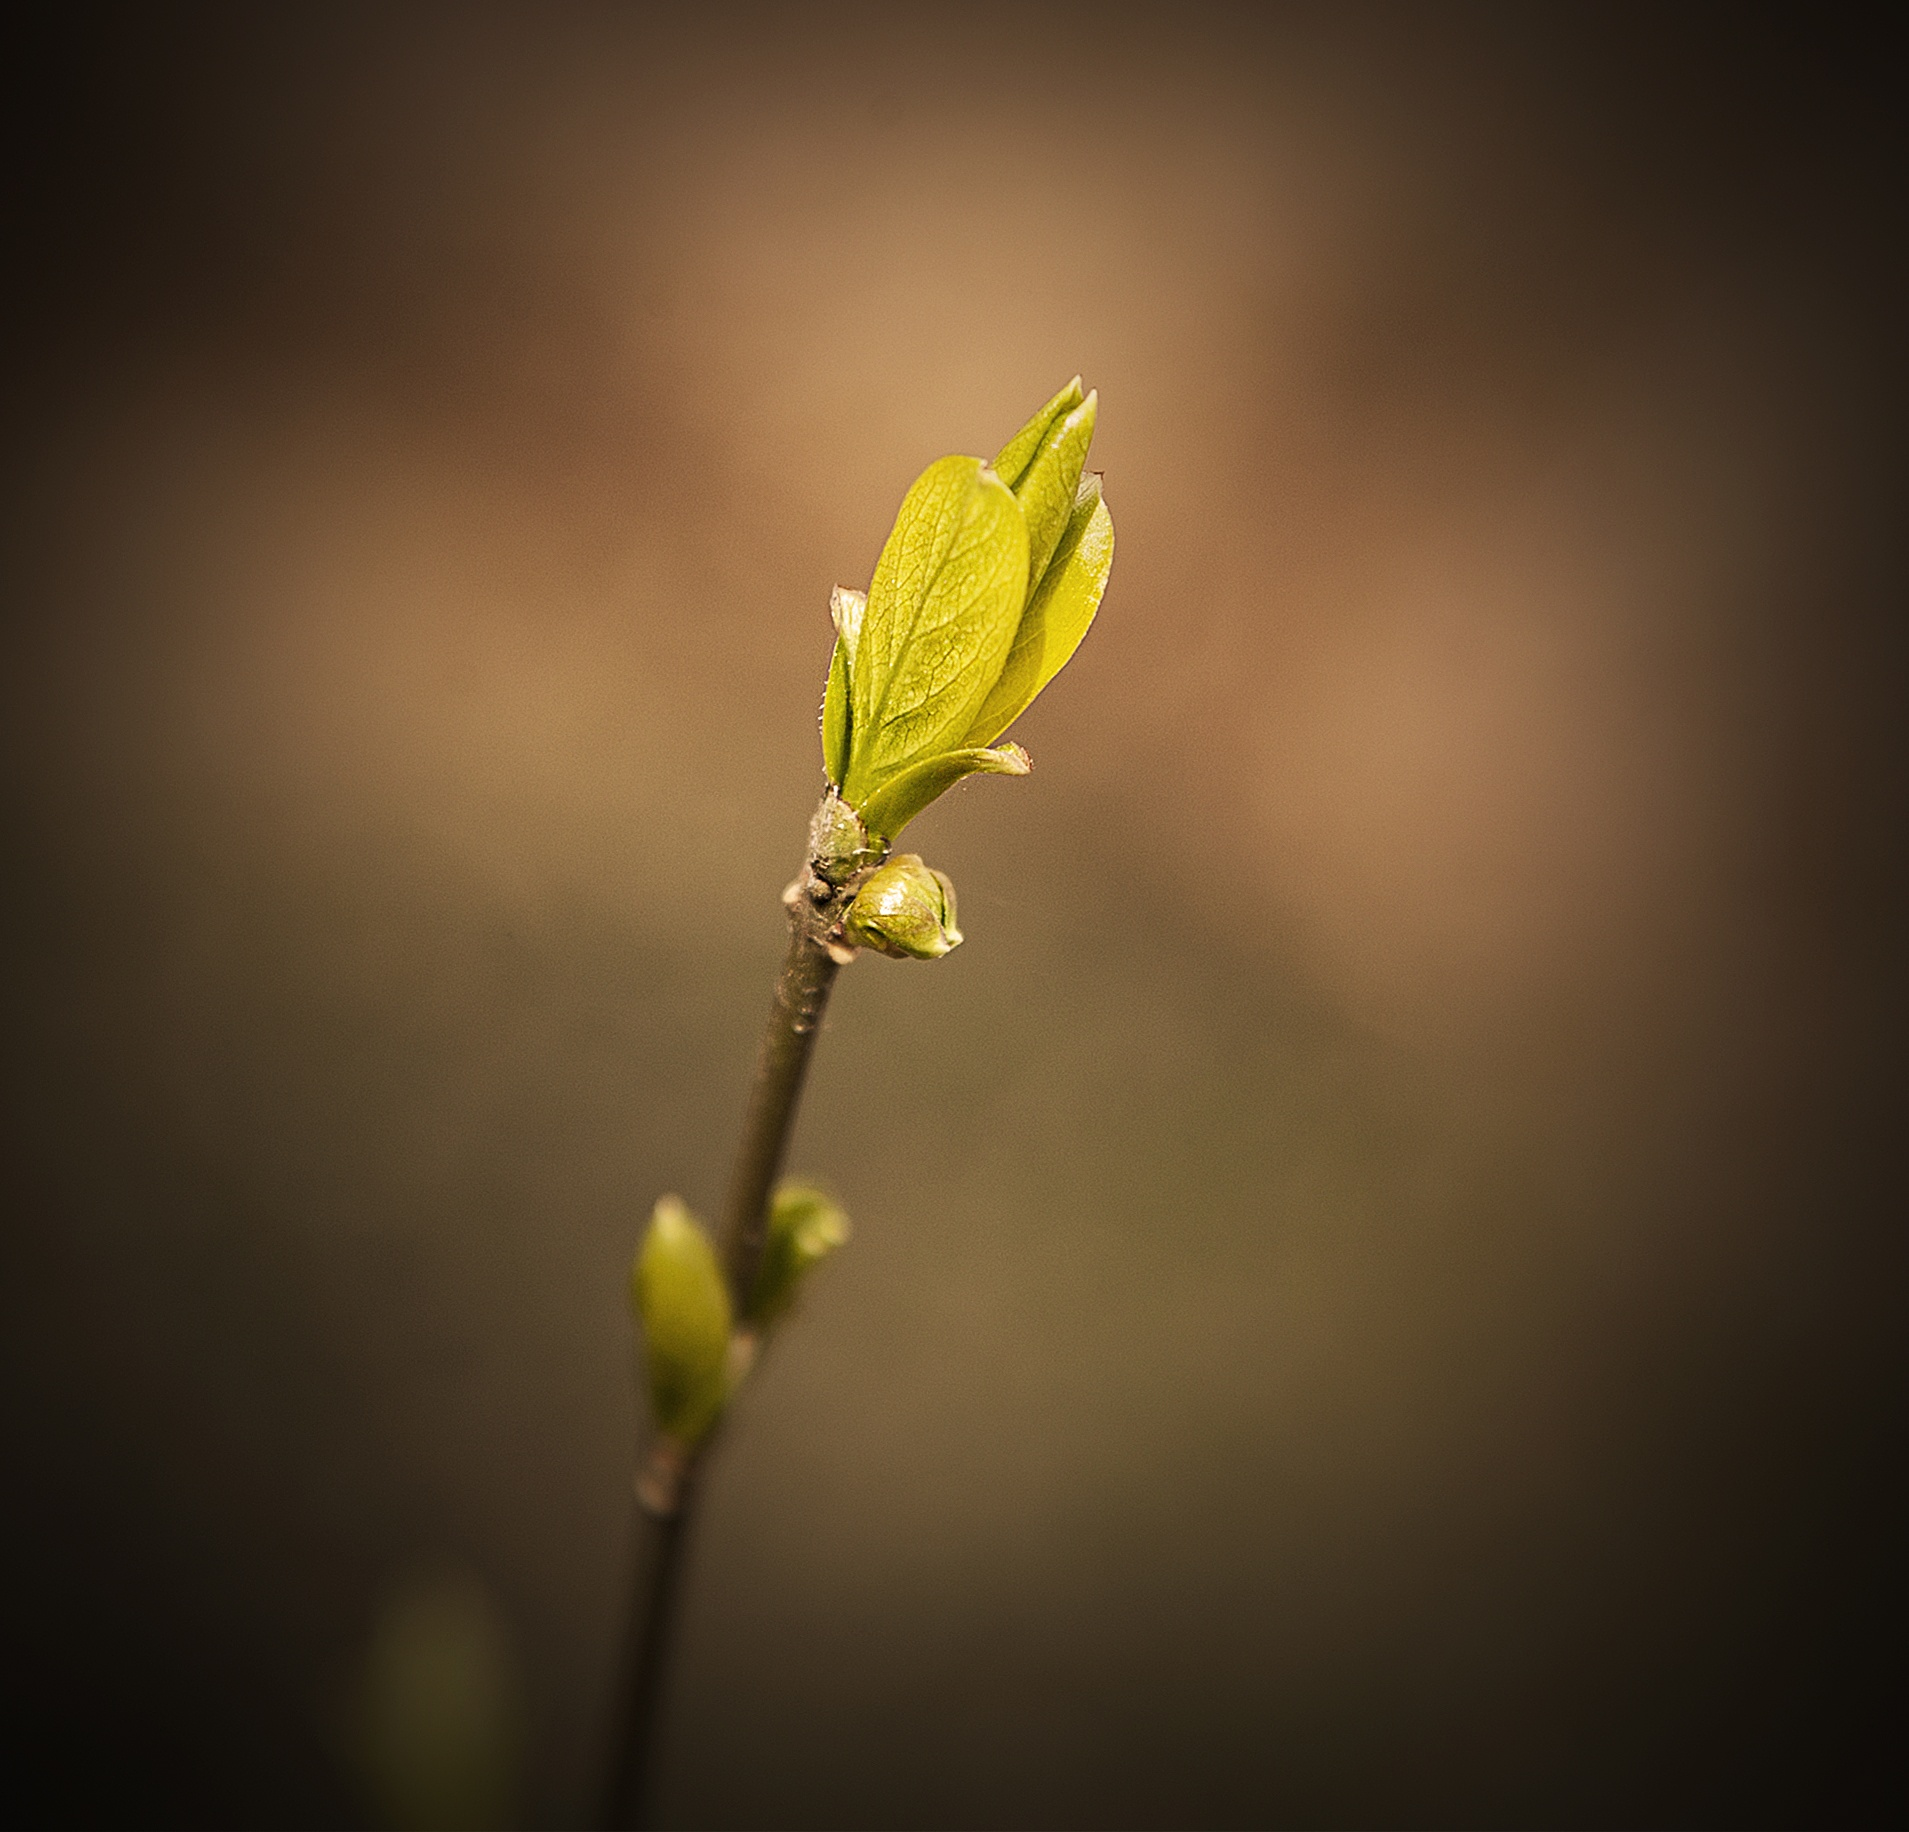 new life by leonard.petraru